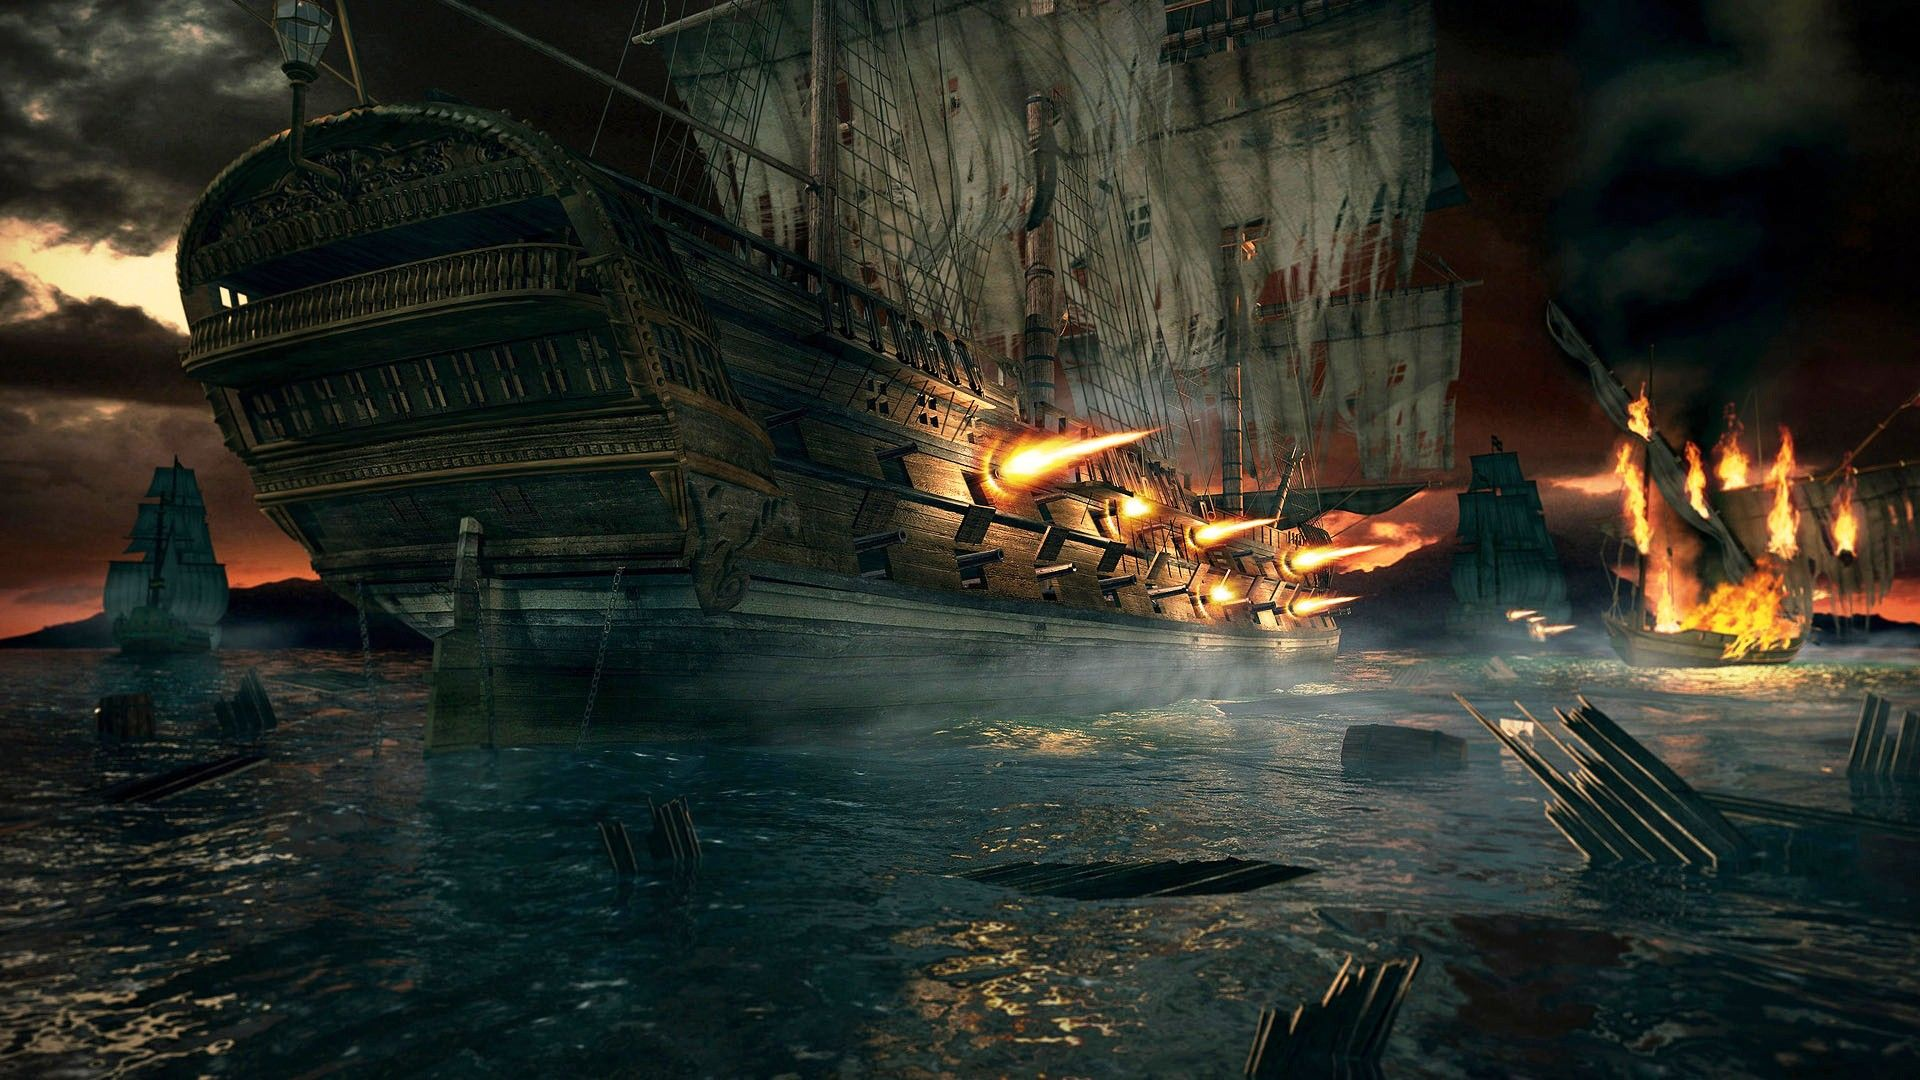 World Of Warcraft Sea Pirates The Caribbean Hd Wallpaper Desktop